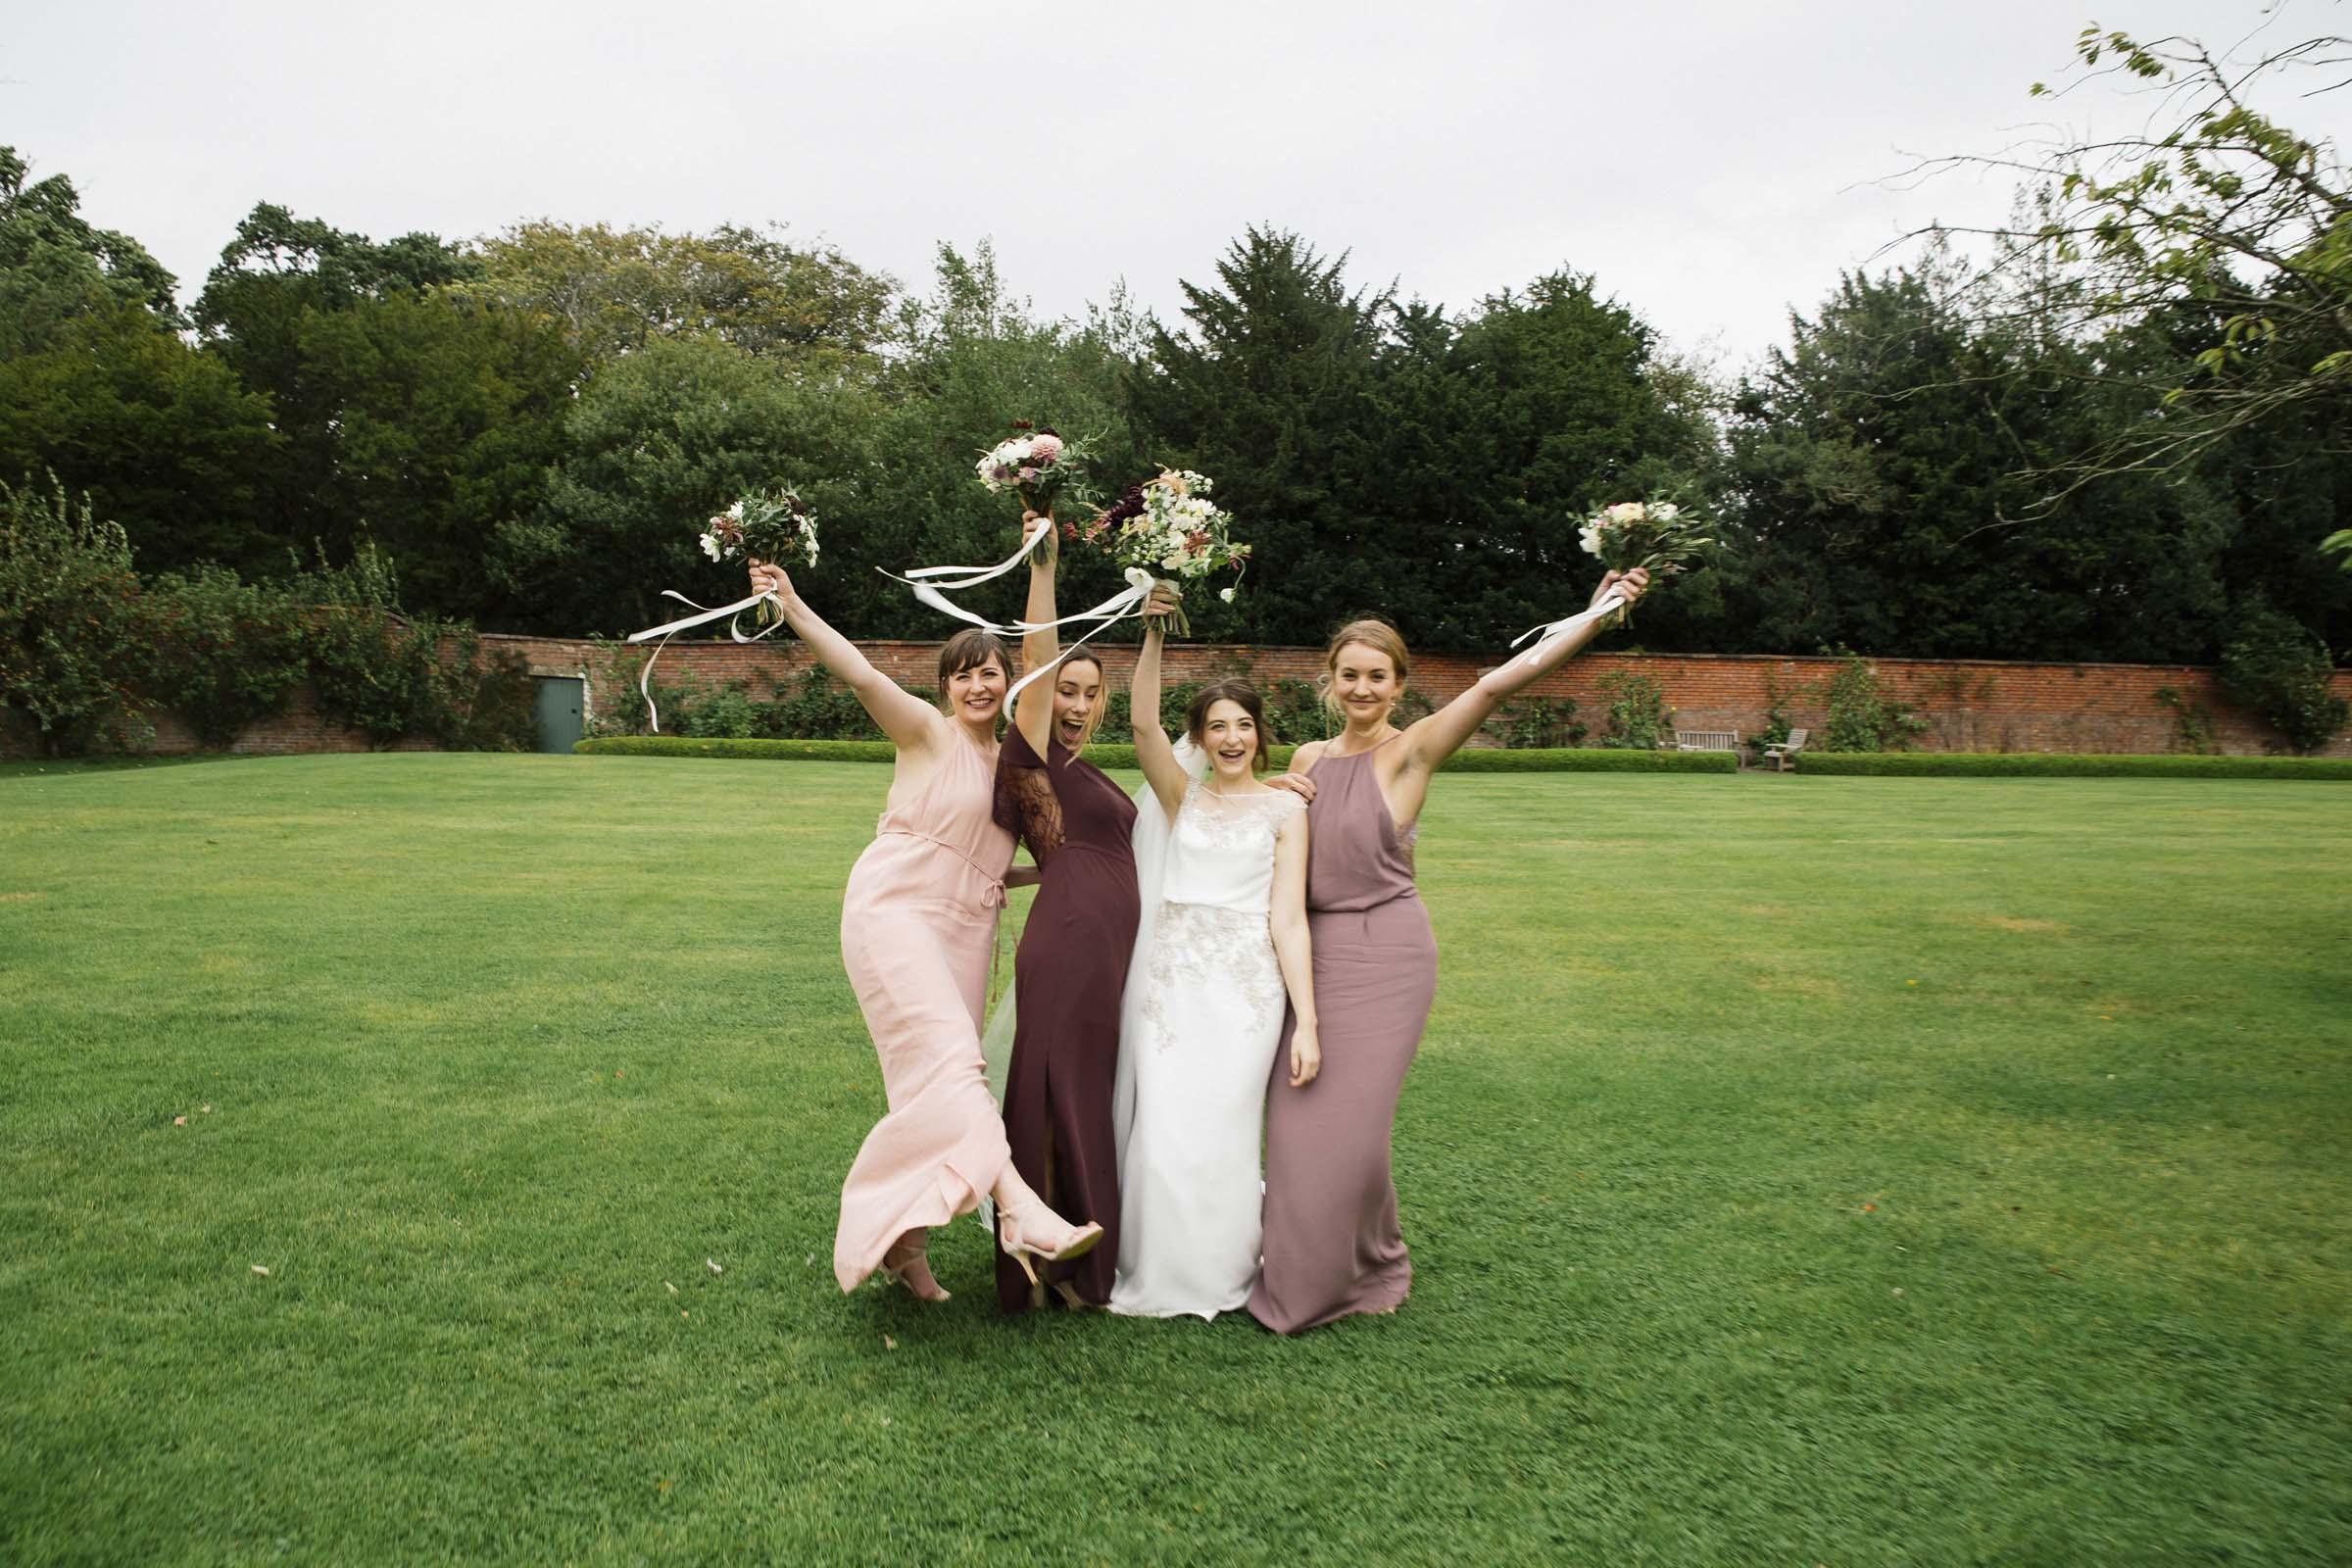 Kirknewton Stables Wedidng by Ceranna Photography| Edinburgh Wedding Photographer